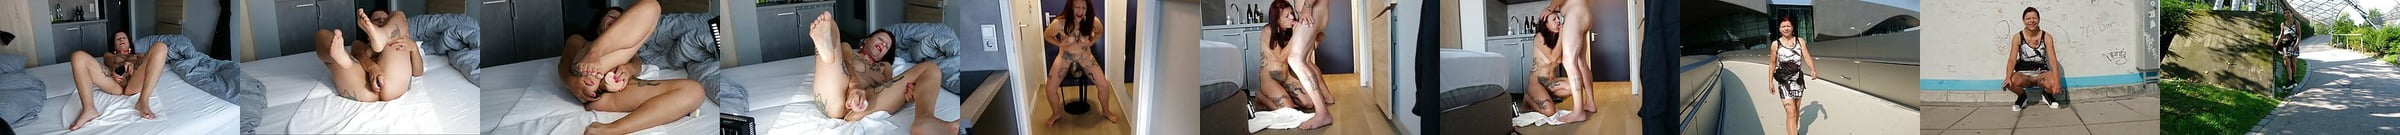 Sasha blonde porn